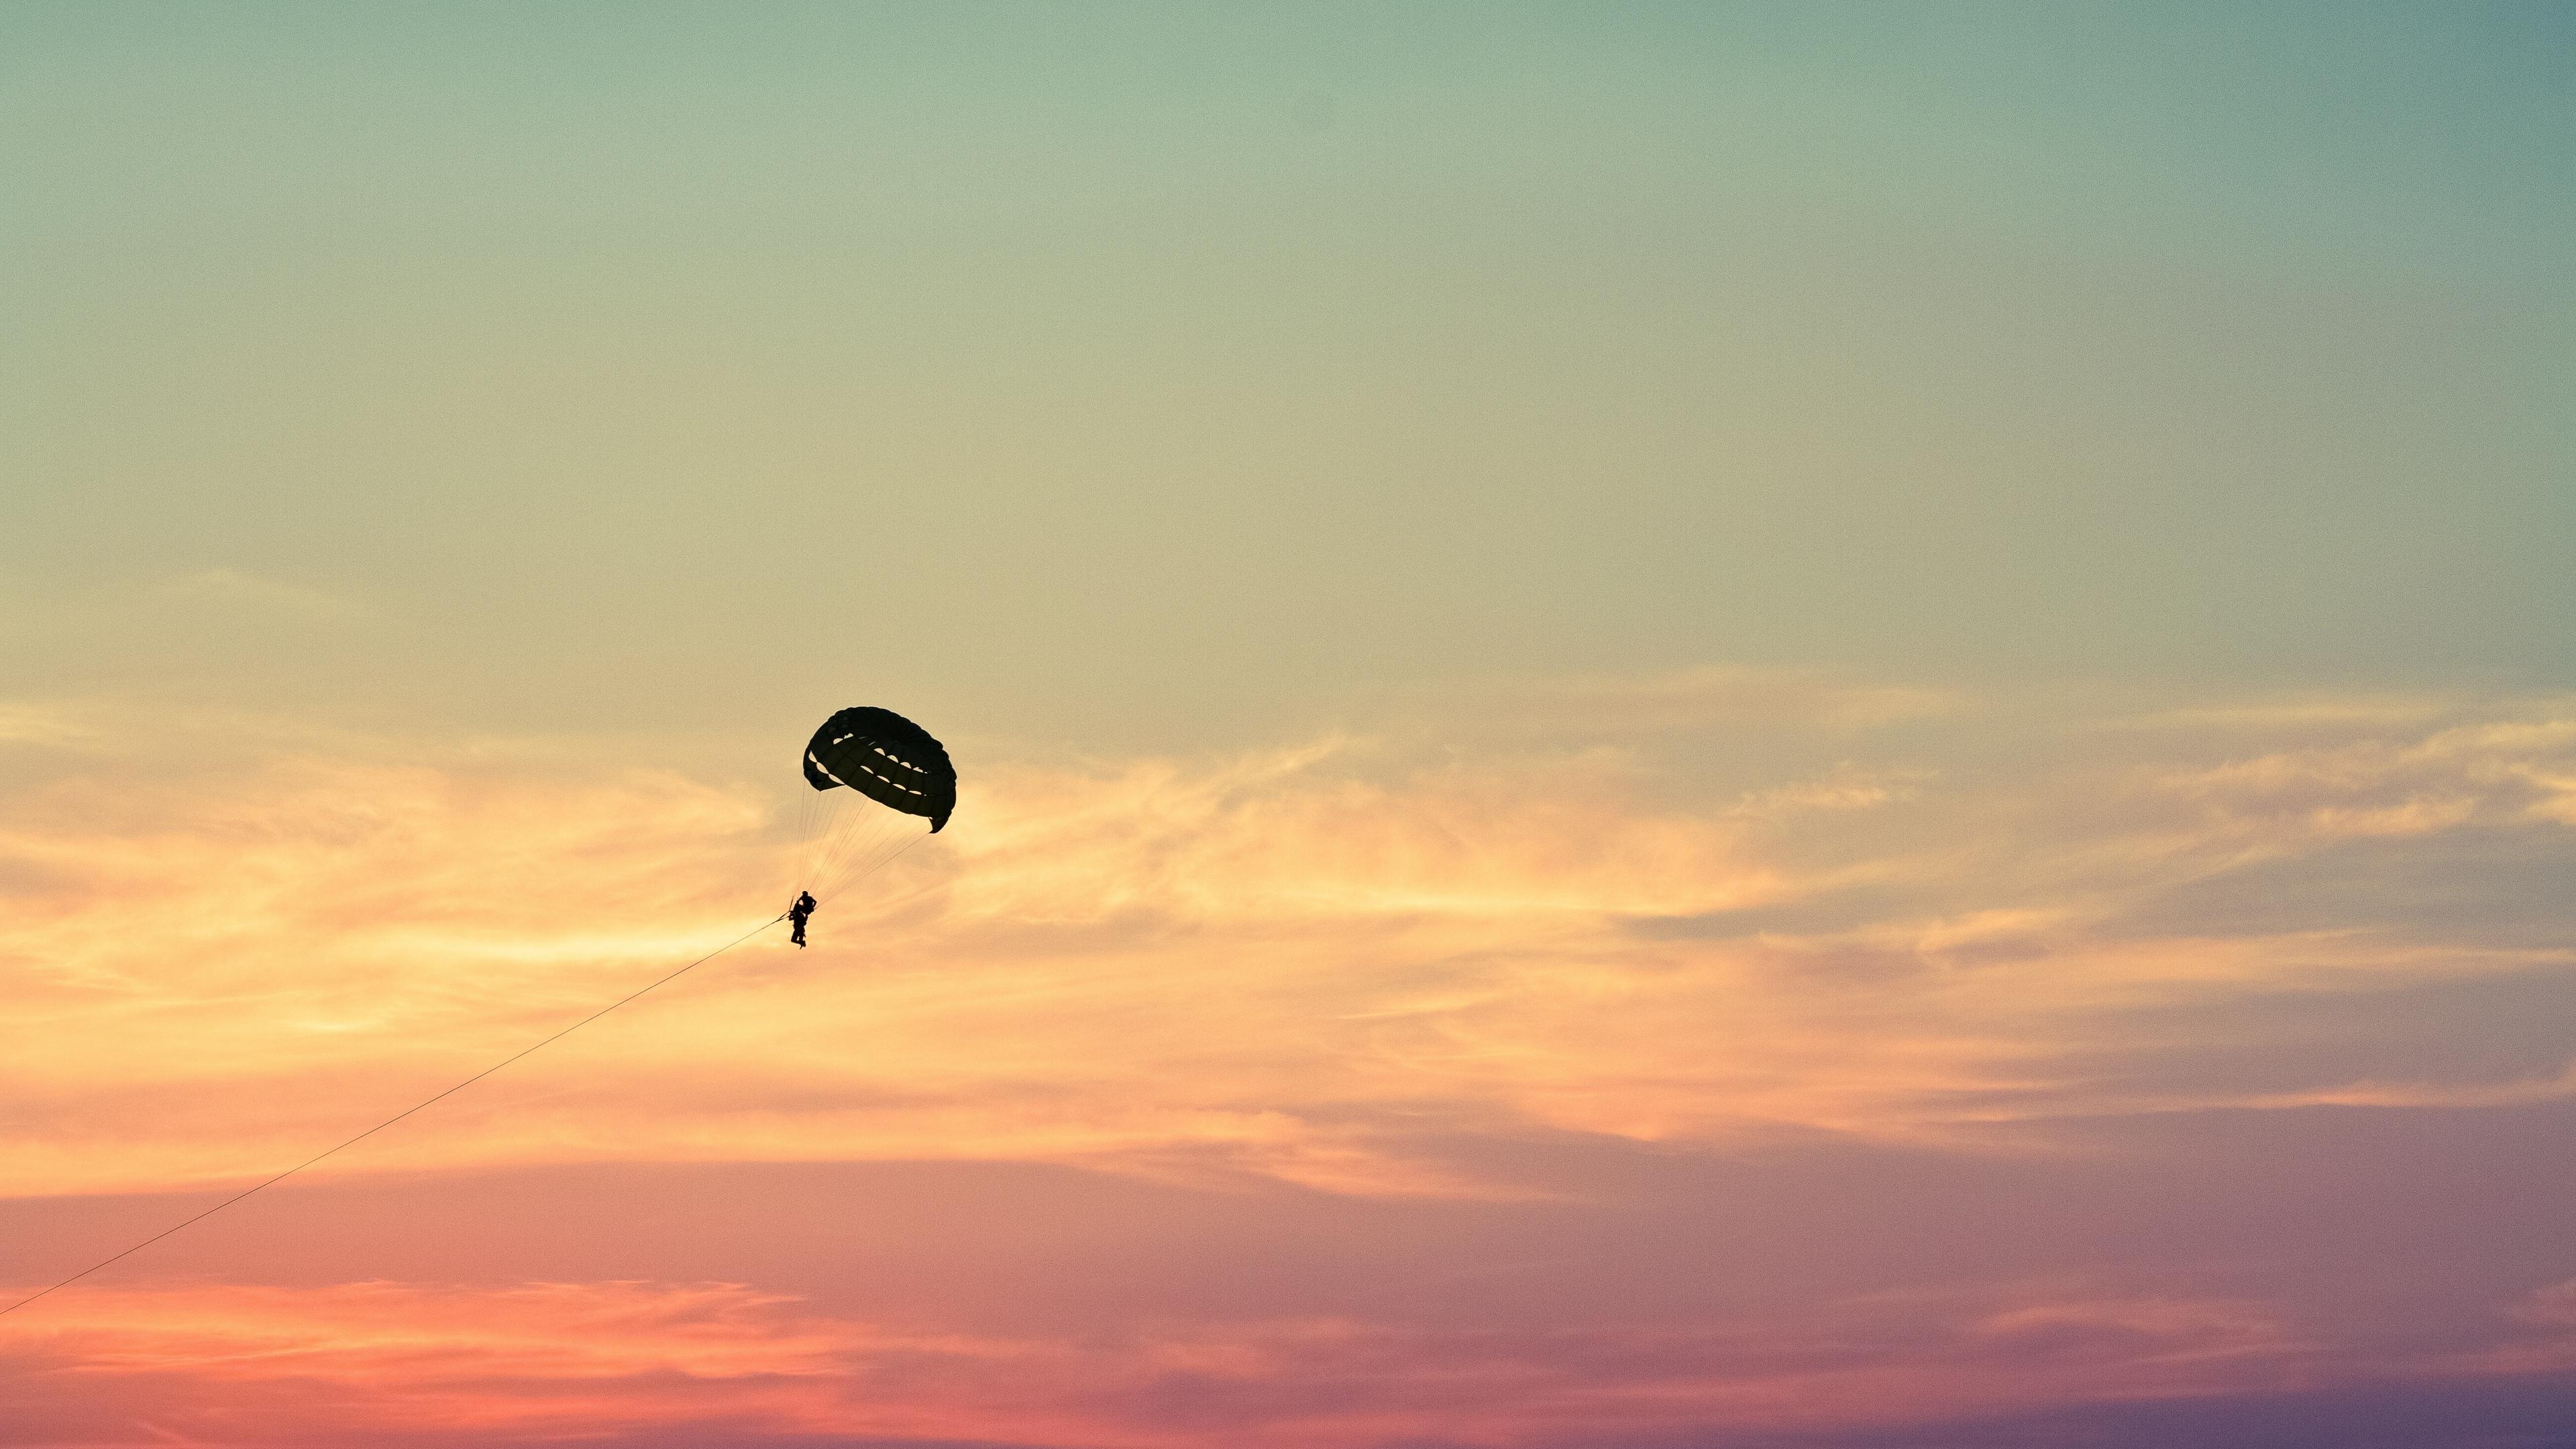 parasailing paragliding flying sky 4k 1540063201 - parasailing, paragliding, flying, sky 4k - parasailing, paragliding, Flying